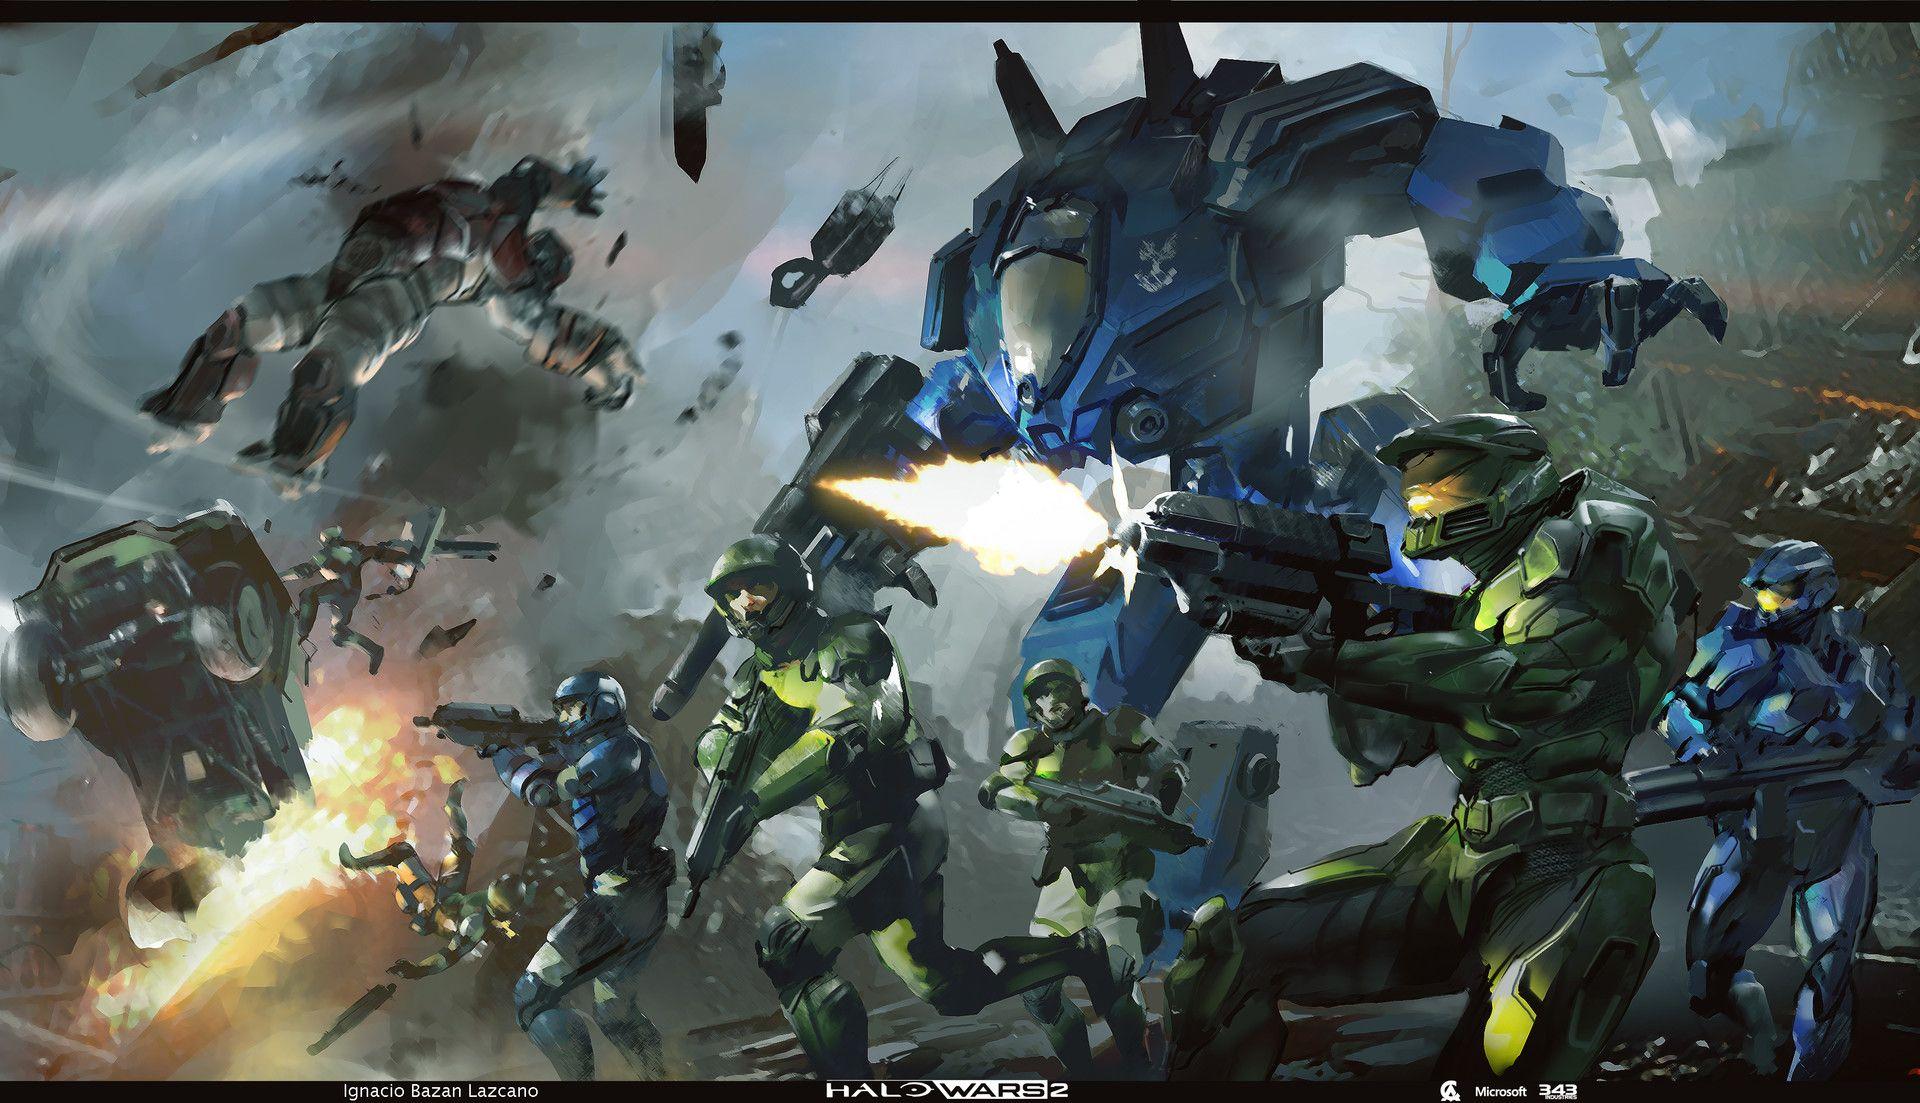 Halo 2a Concept Art Star Wars Wallpaper Concept Art My Favorite Image